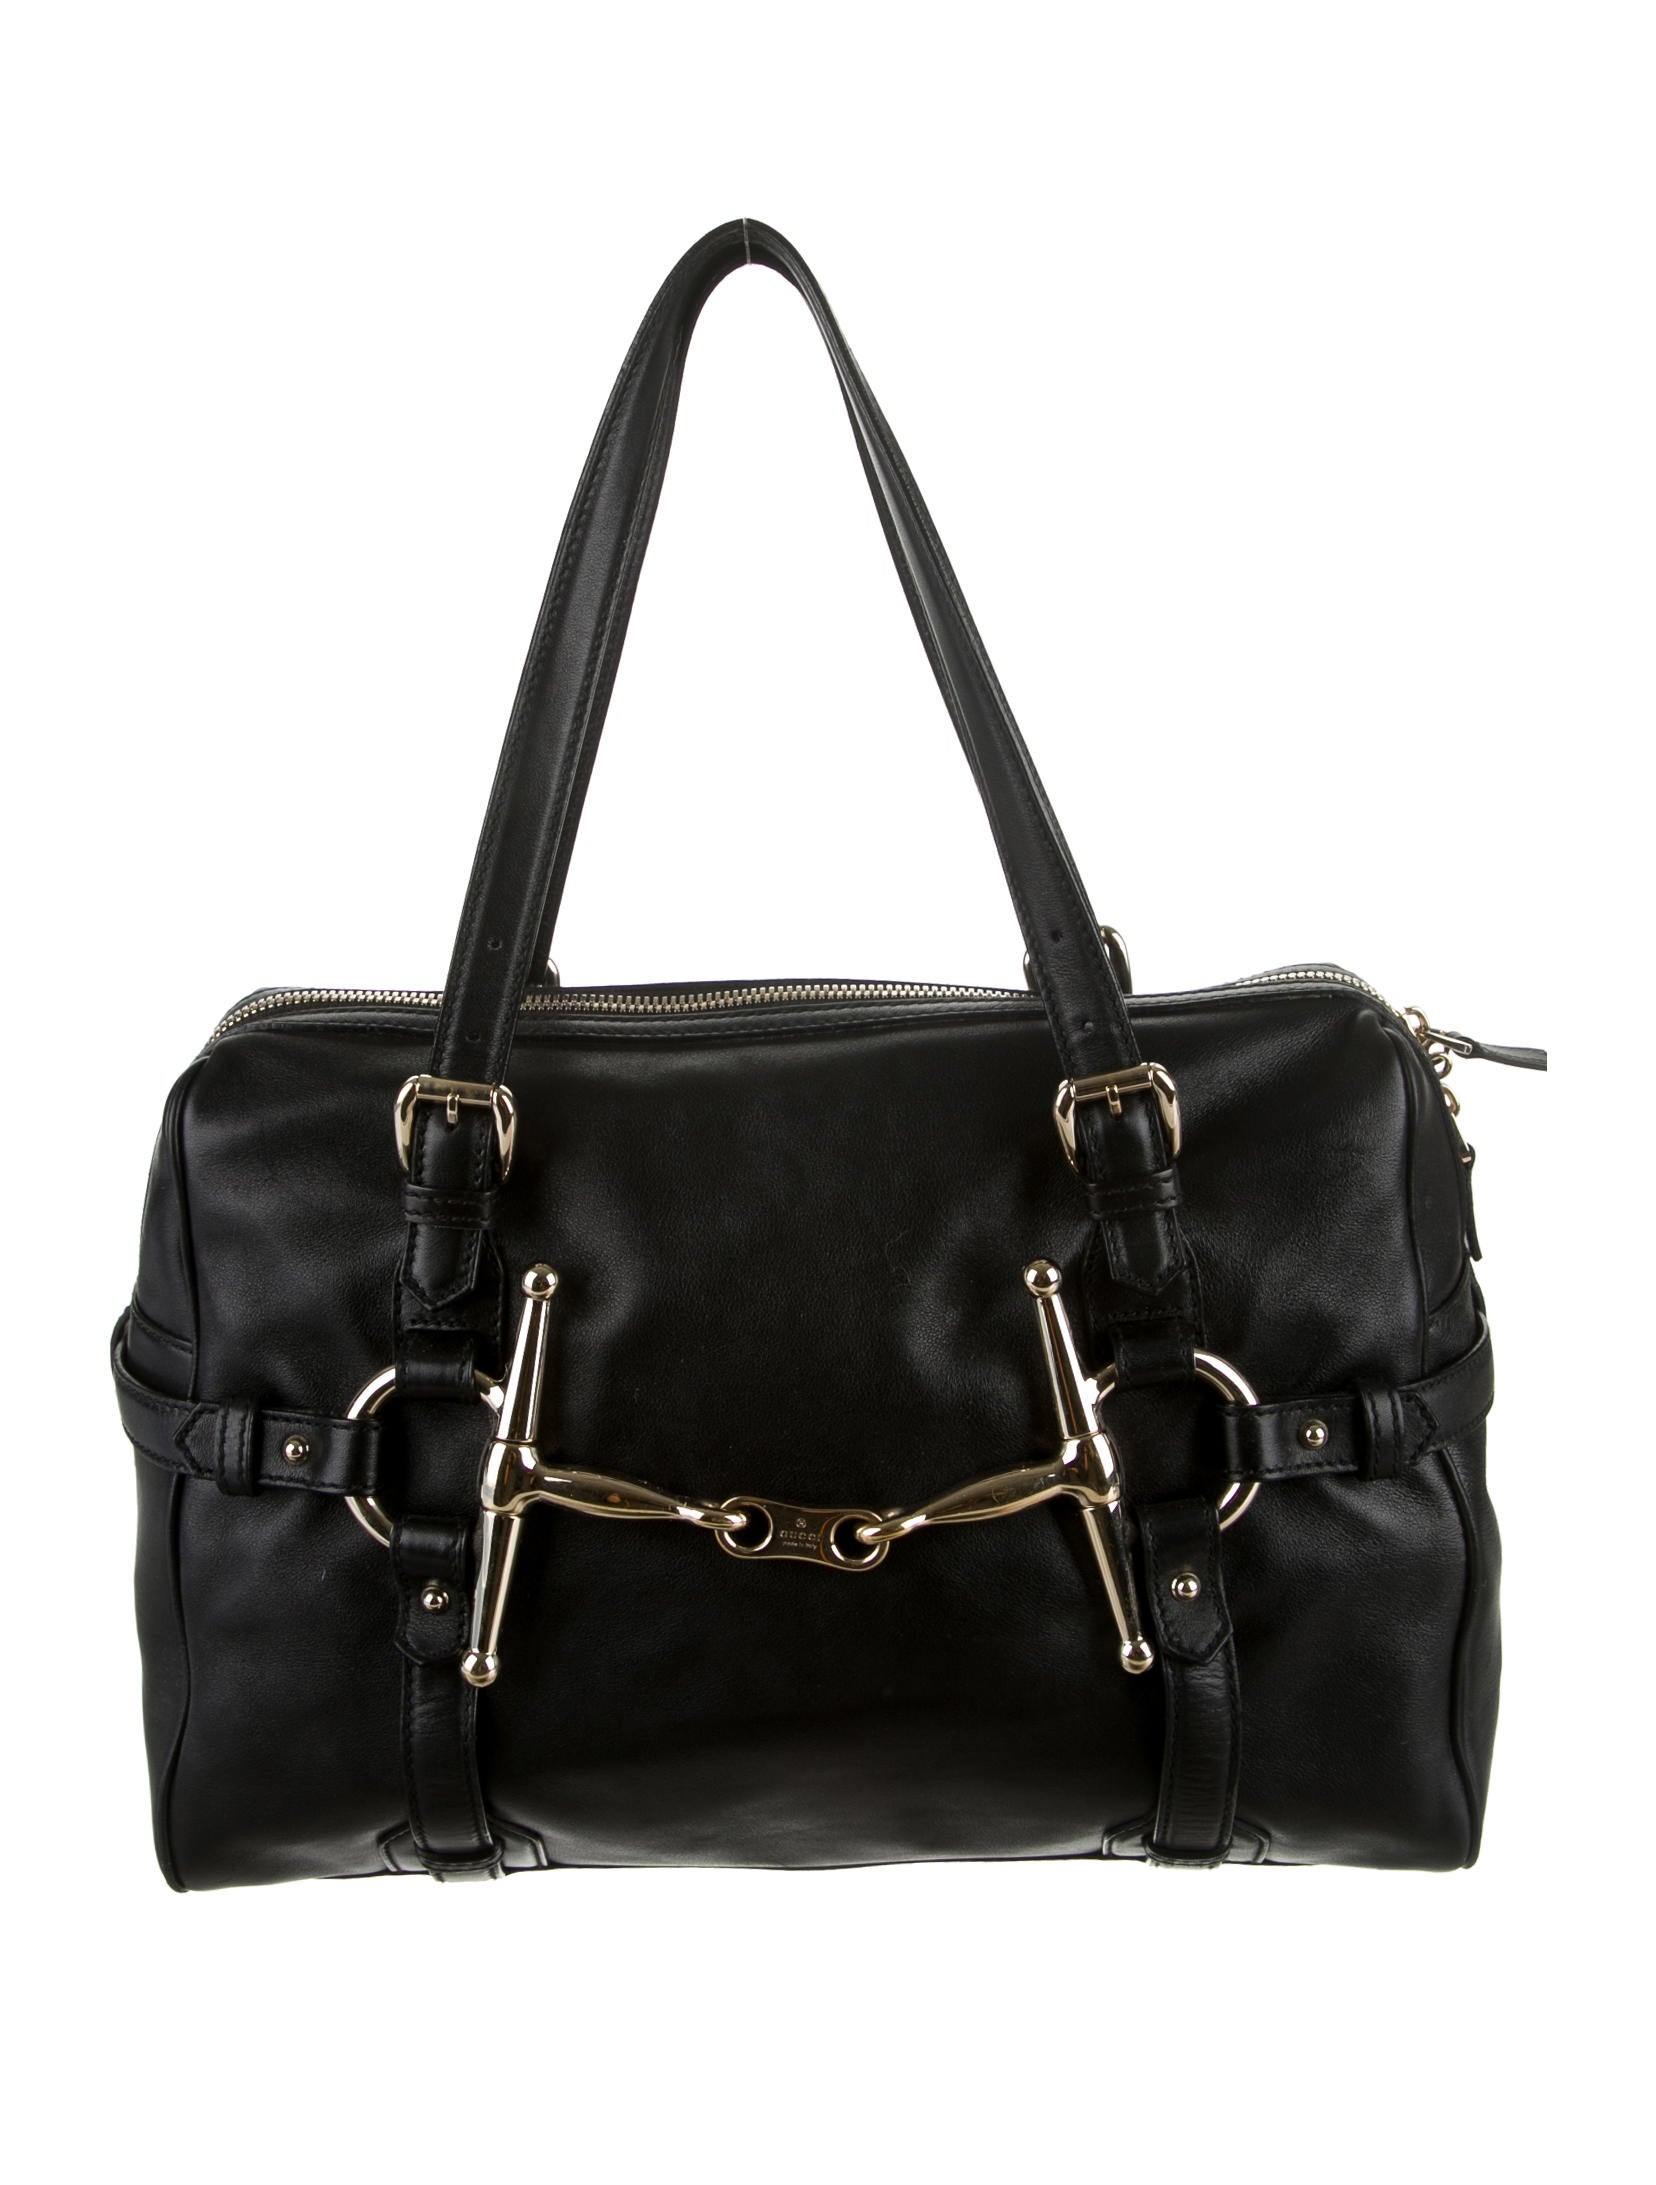 Boston Bag Patchwork Tutorial: Gucci 85th Anniversary Boston Bag